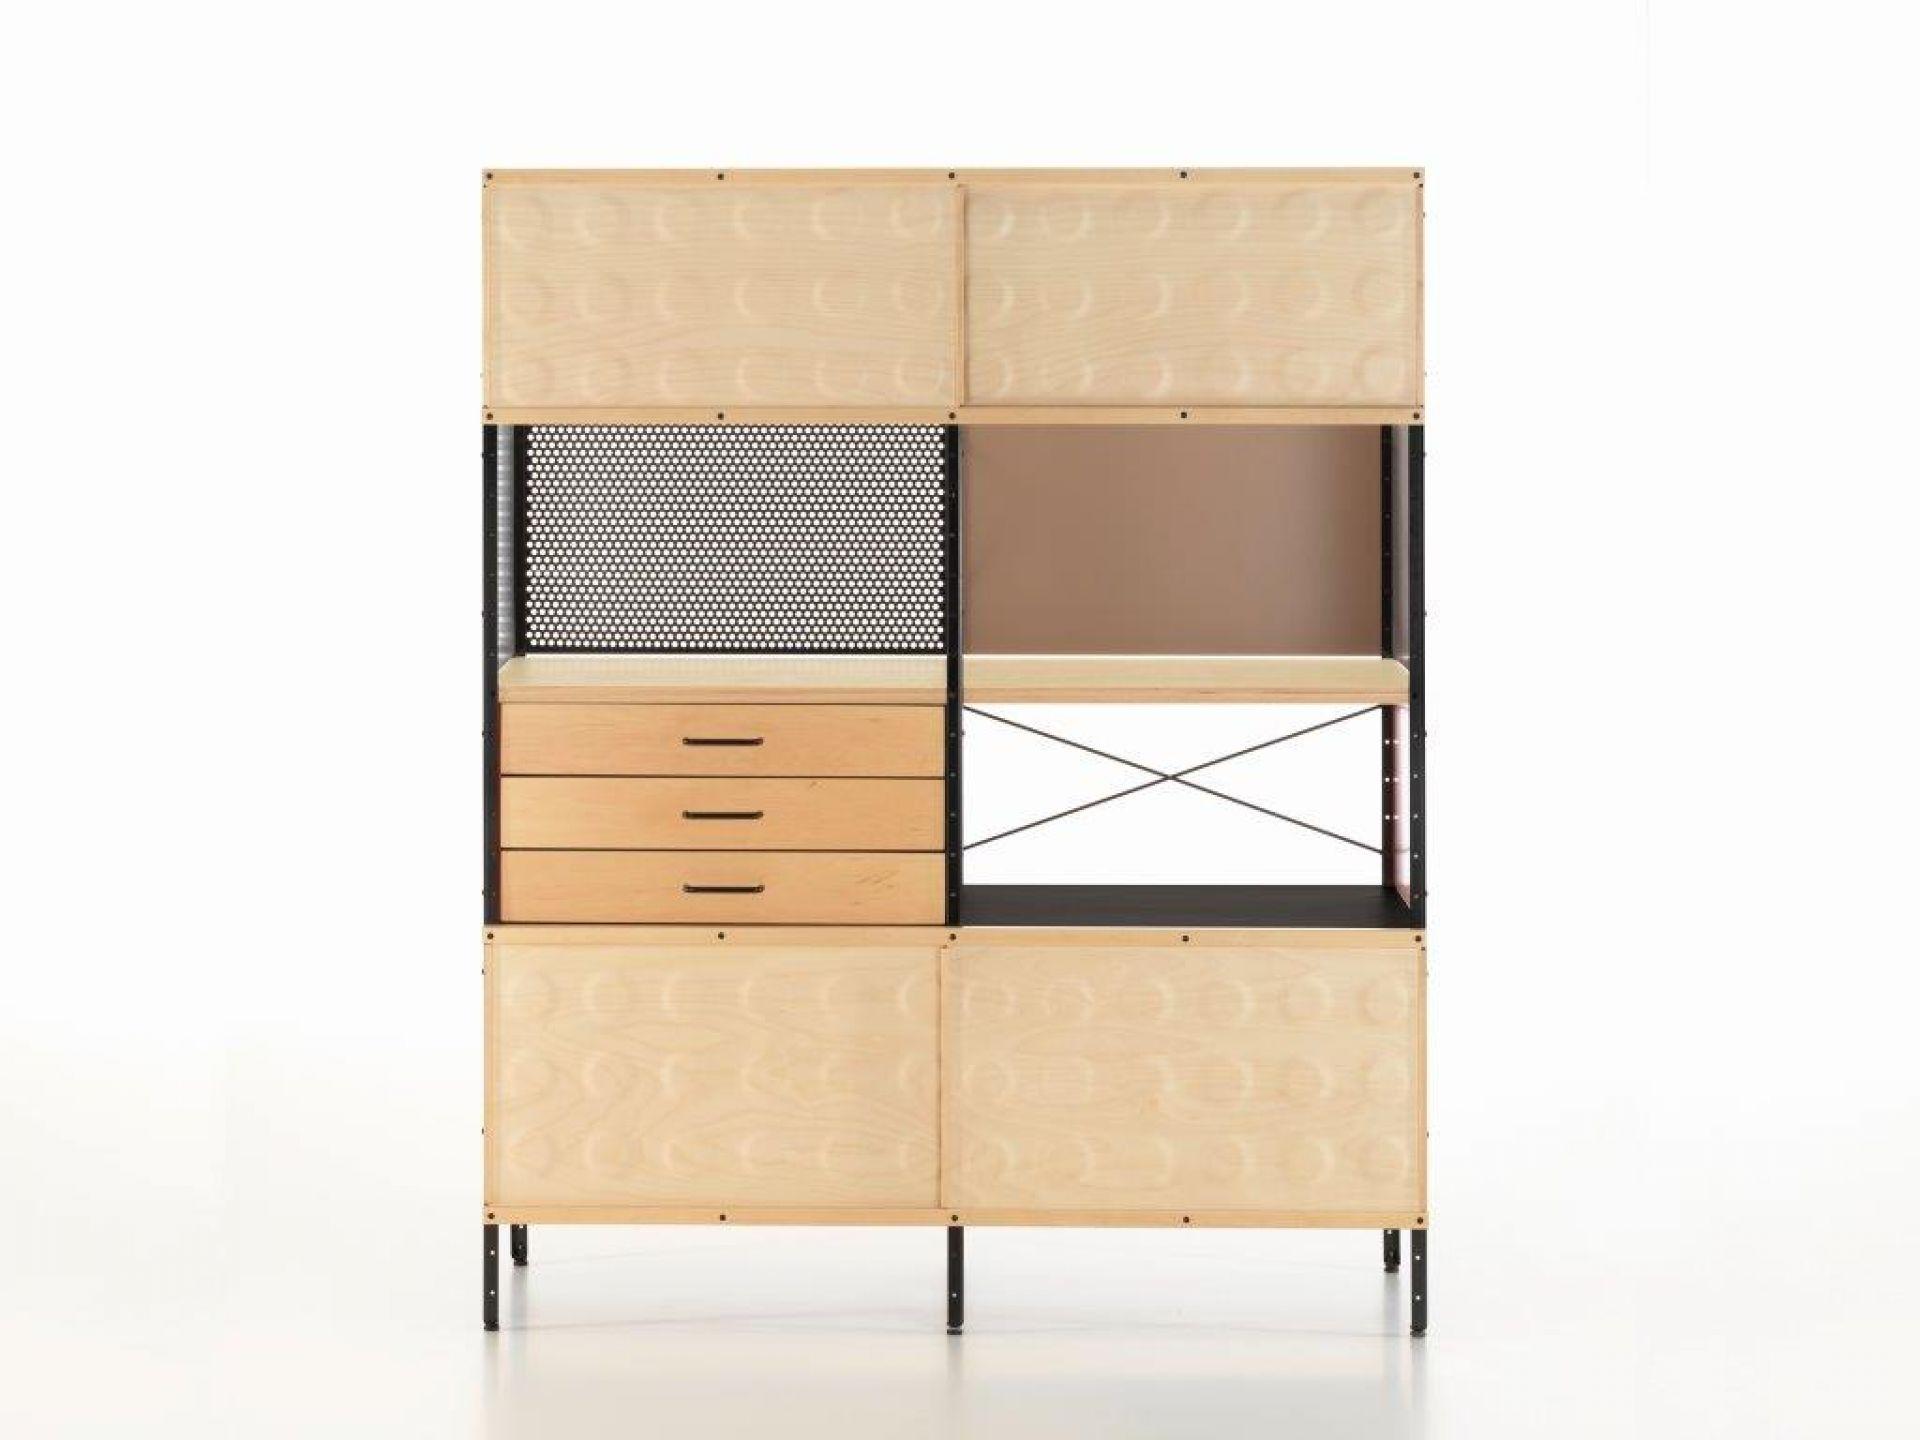 Eames Storage Unit ESU Bücherregal Vitra